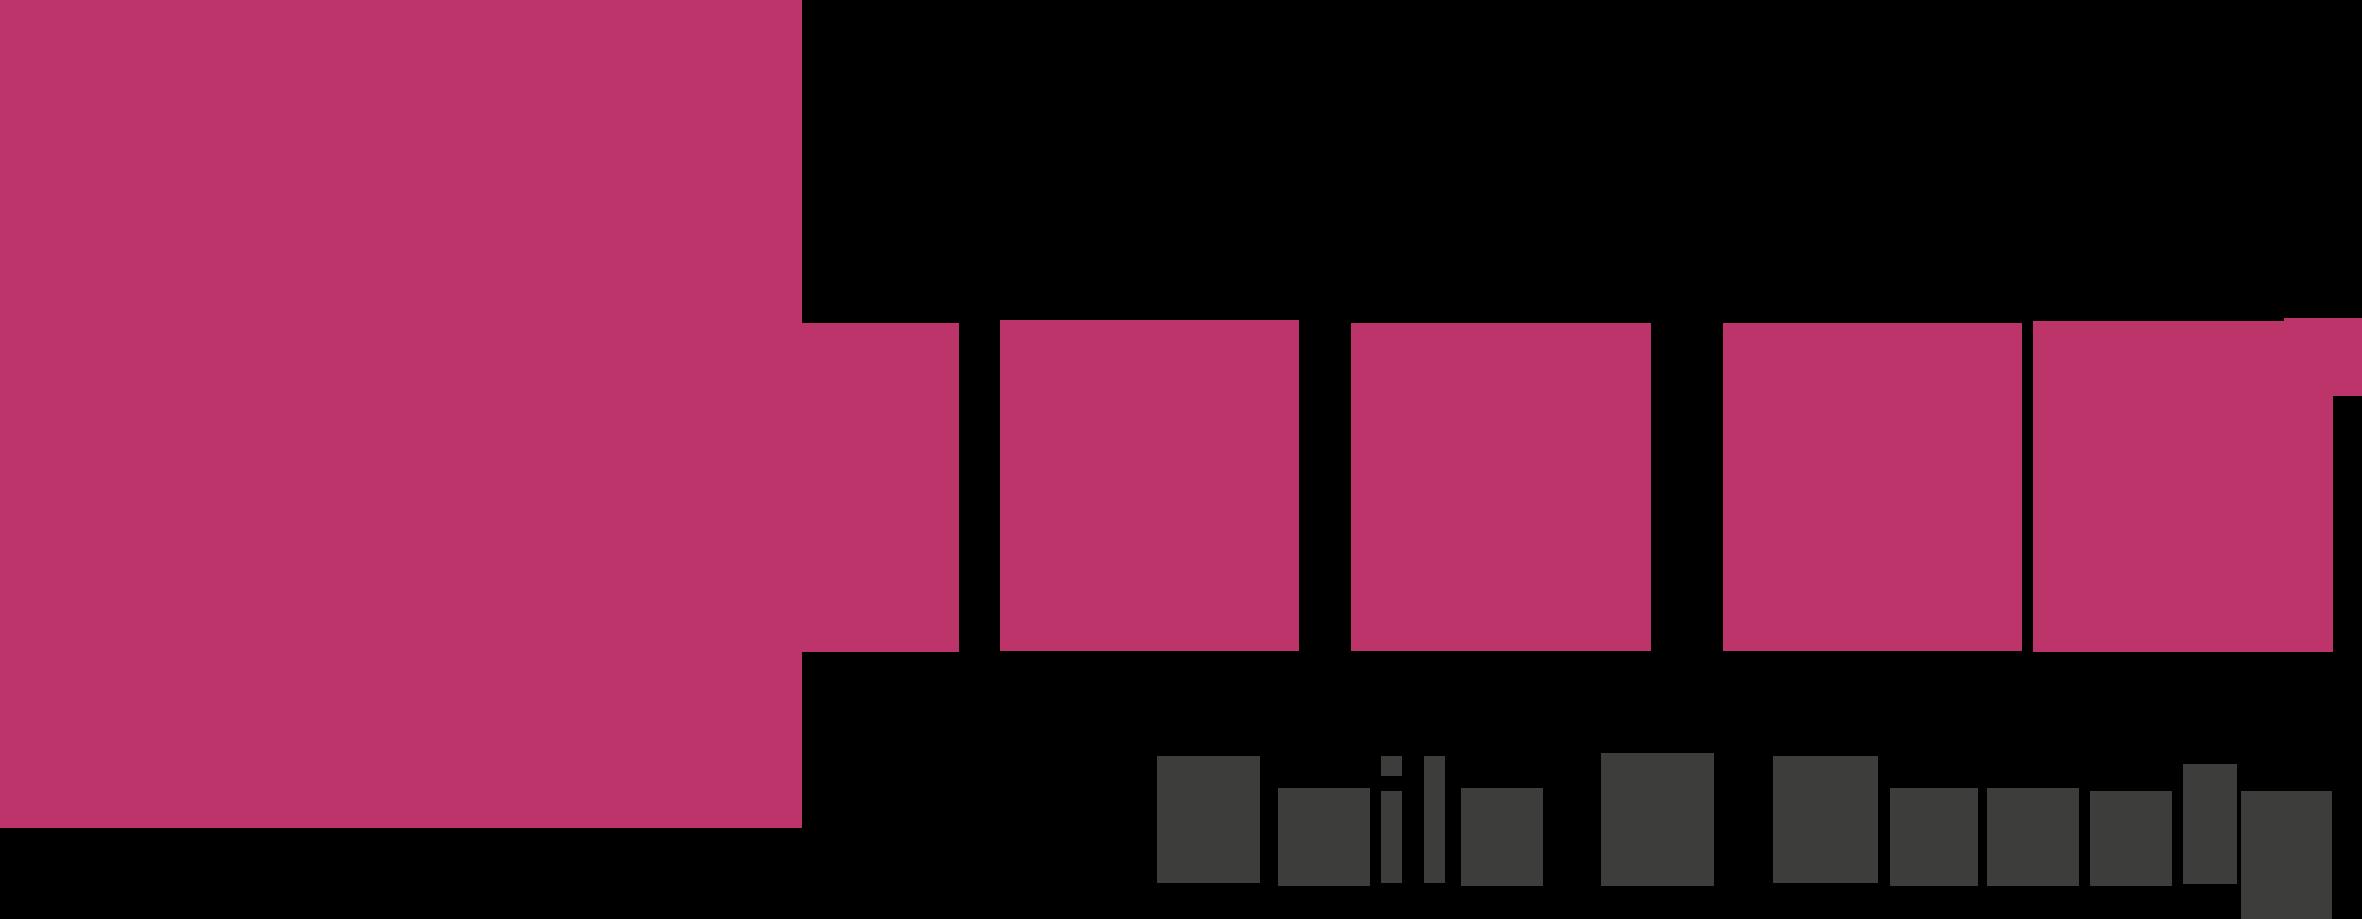 Amanda Nails Nagelstudio Zürich | Nägel ab 59.- | Nail Academy | Kosmetik Produkte | IPL | UV Gel | Zahnbleaching | Wimpernverlängerung